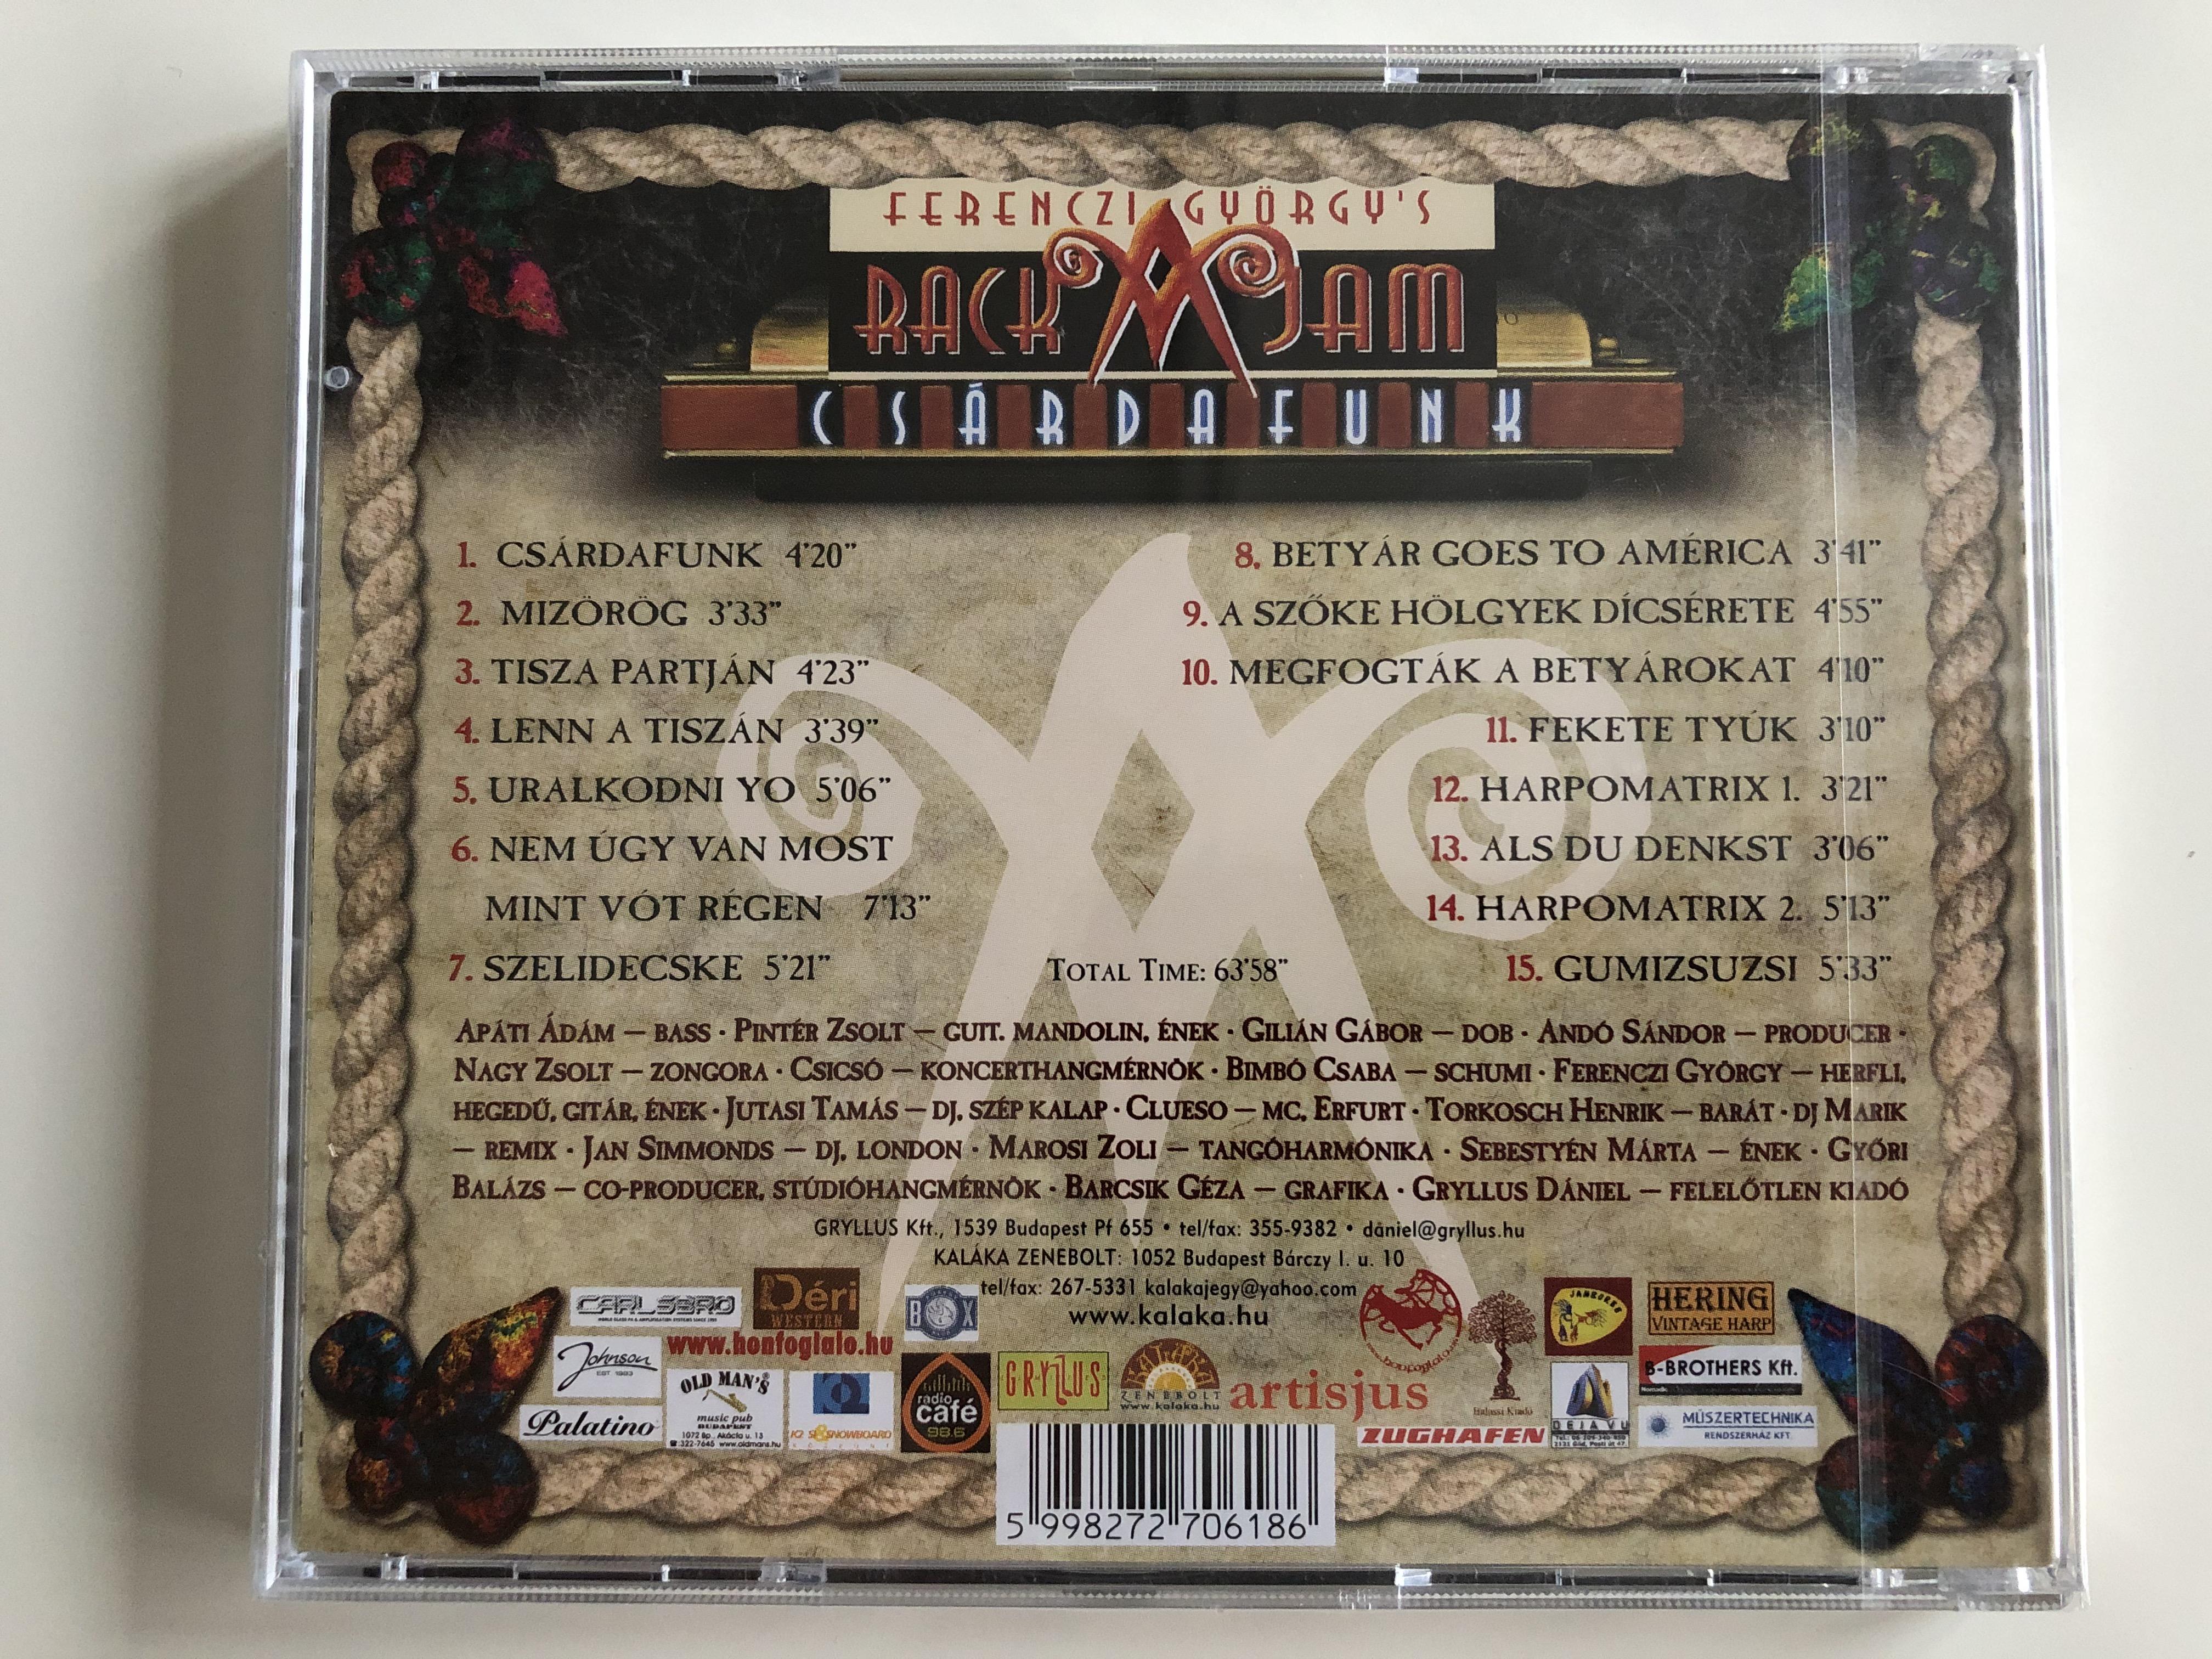 ferenczi-gy-rgy-s-rackajam-cs-rdafunk-gryllus-audio-cd-2015-gcd-044-2-.jpg